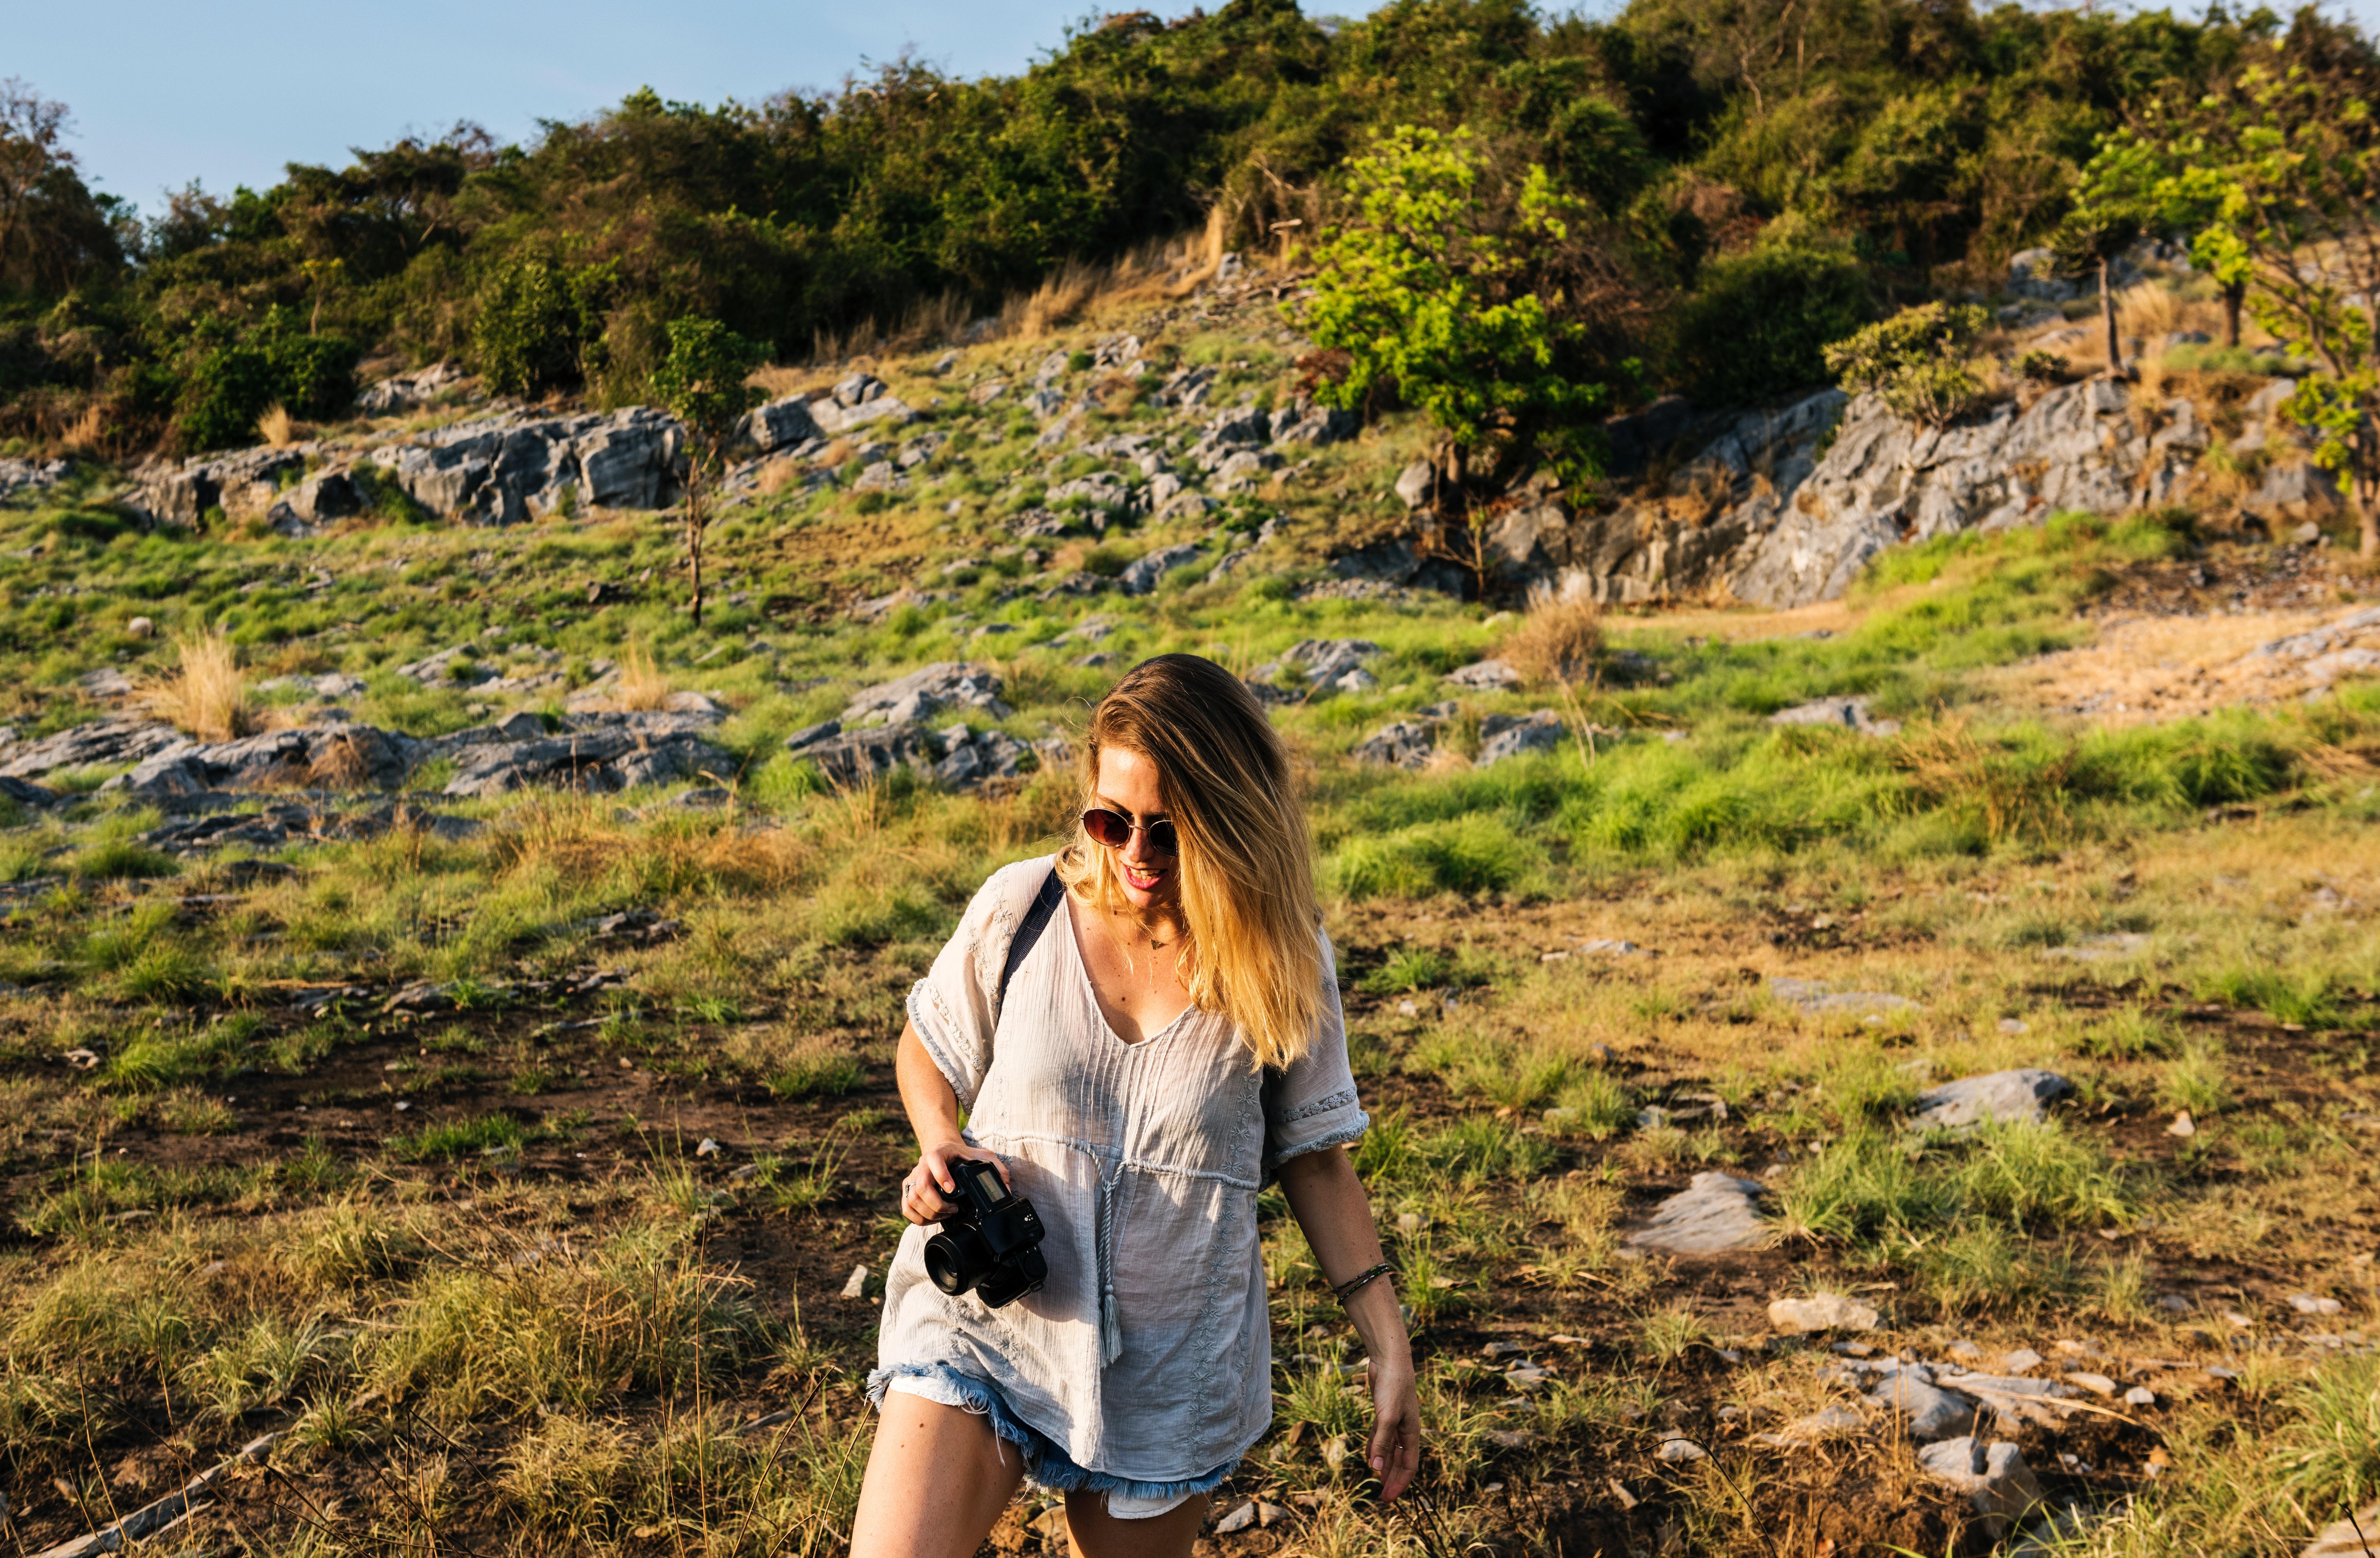 Woman holding black dslr camera near forest photo